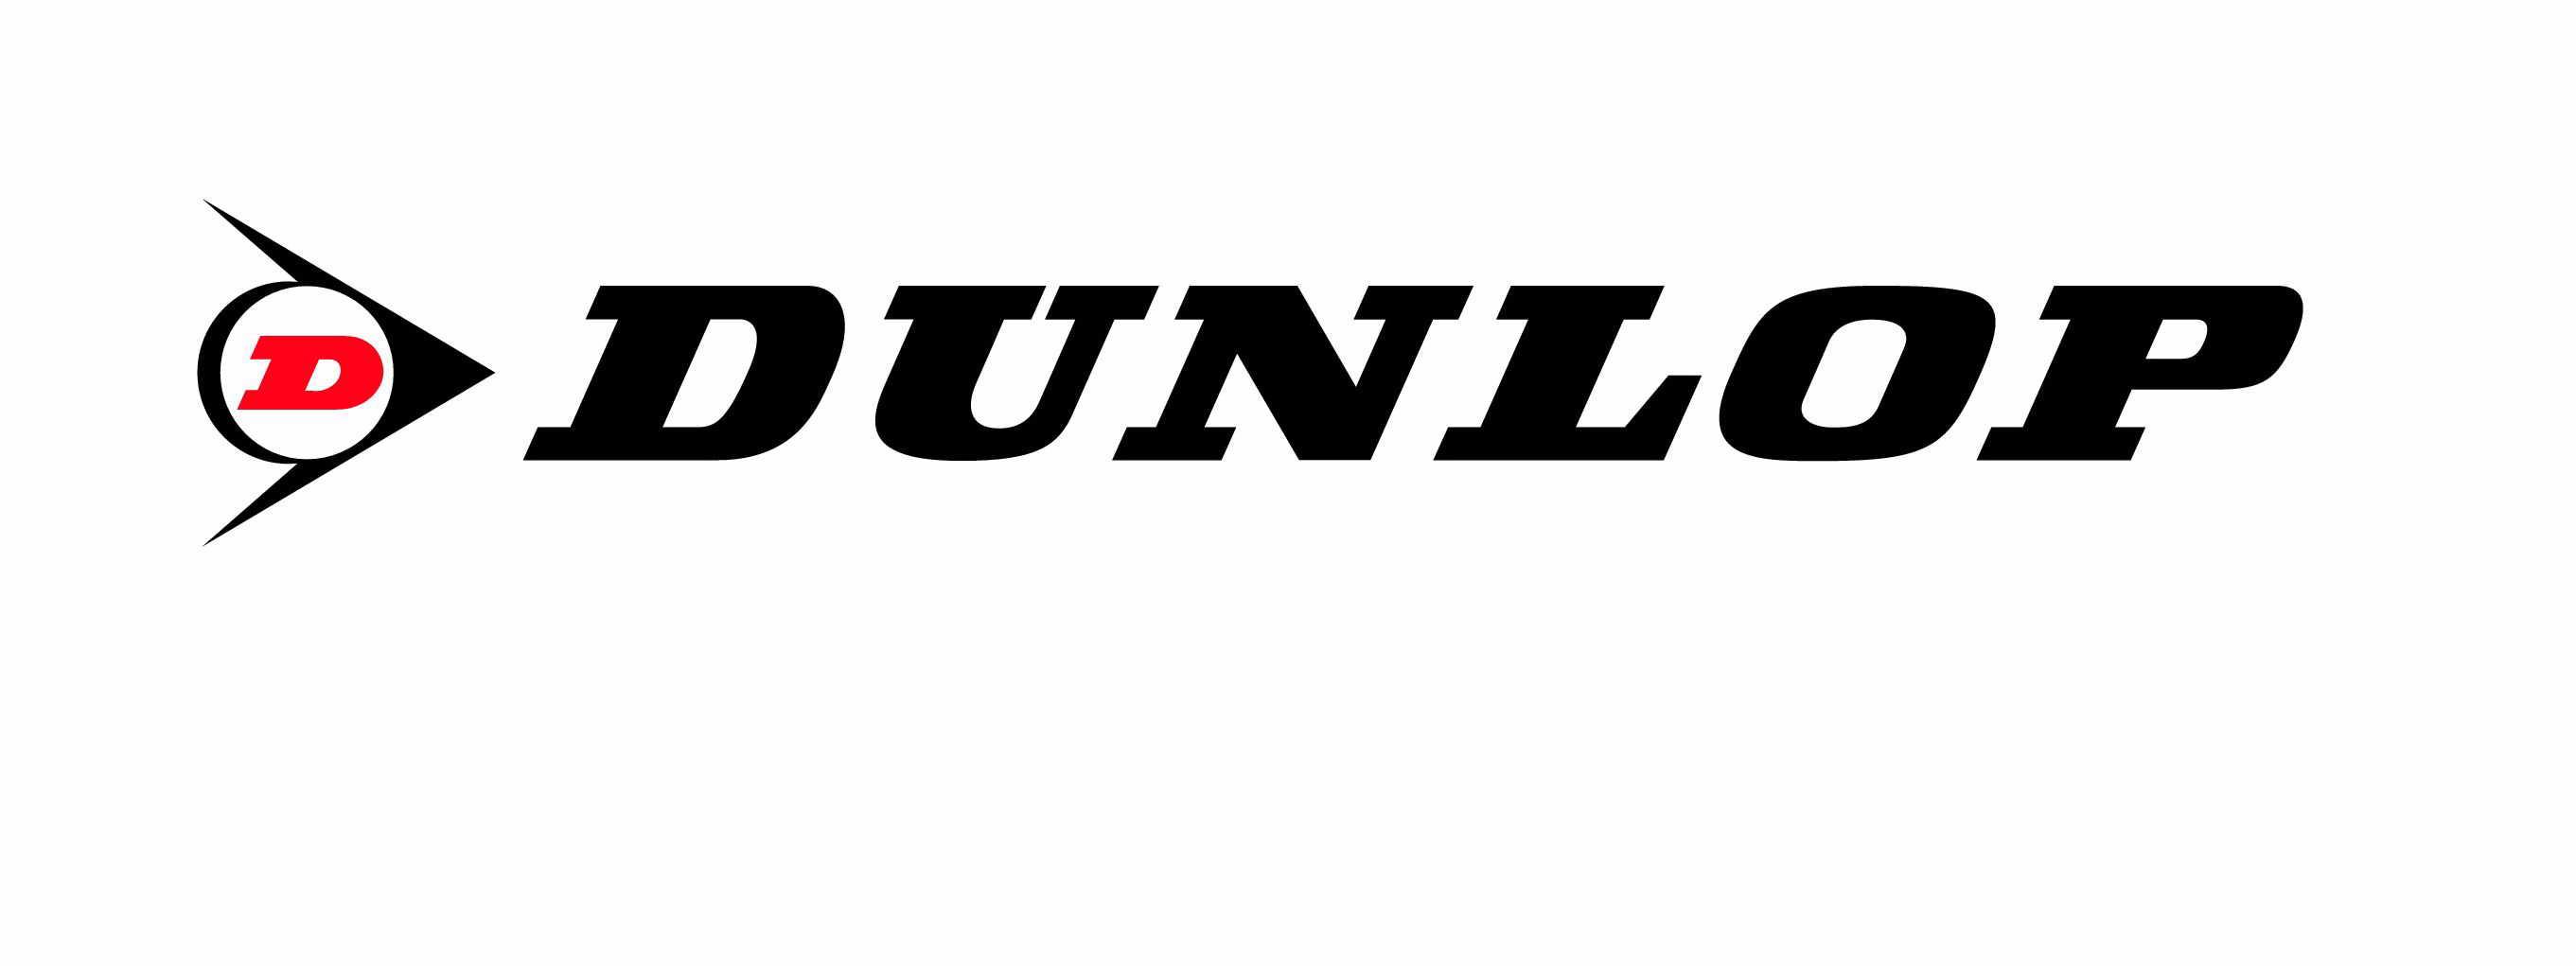 Dunlop PNG - 110431